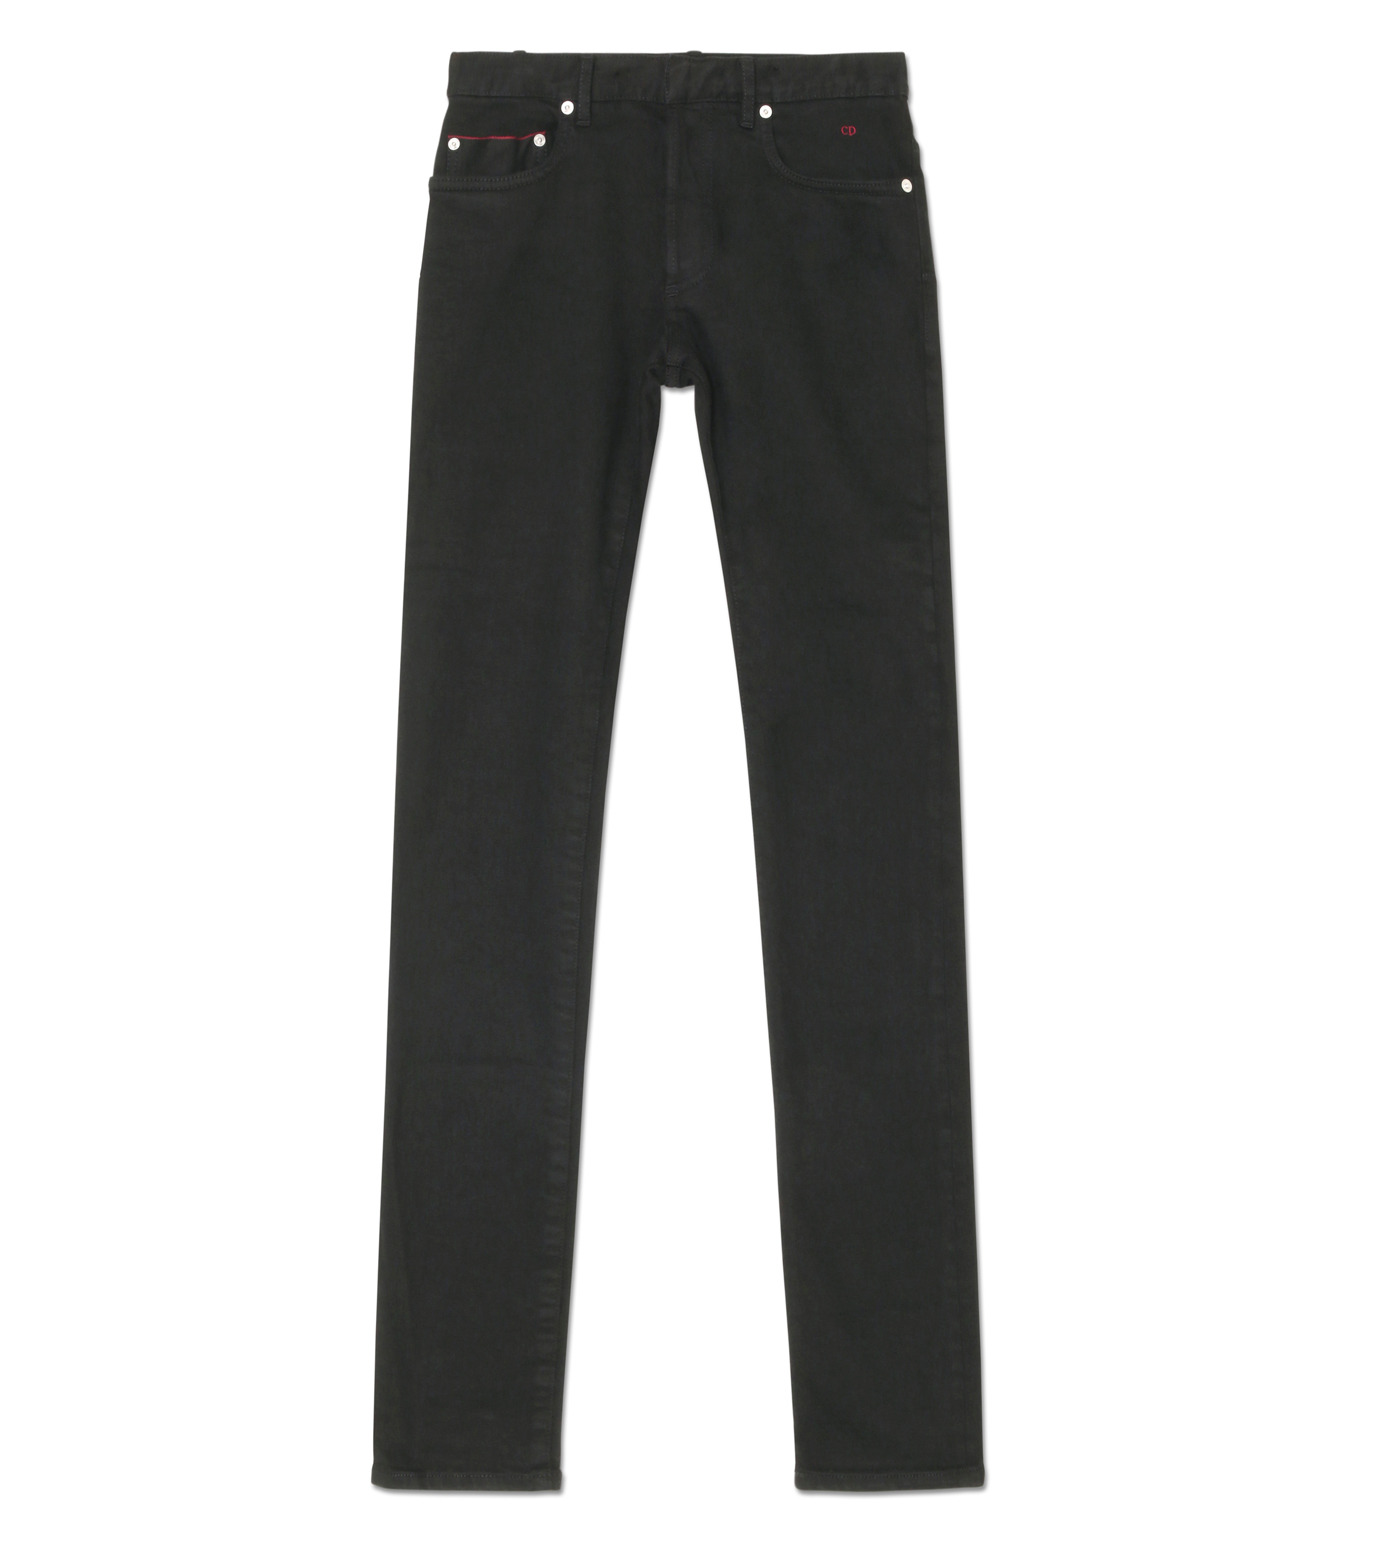 Dior Homme(ディオール オム)のStrech Pants-BLACK(デニム/denim)-633D042Y3838-13 拡大詳細画像1